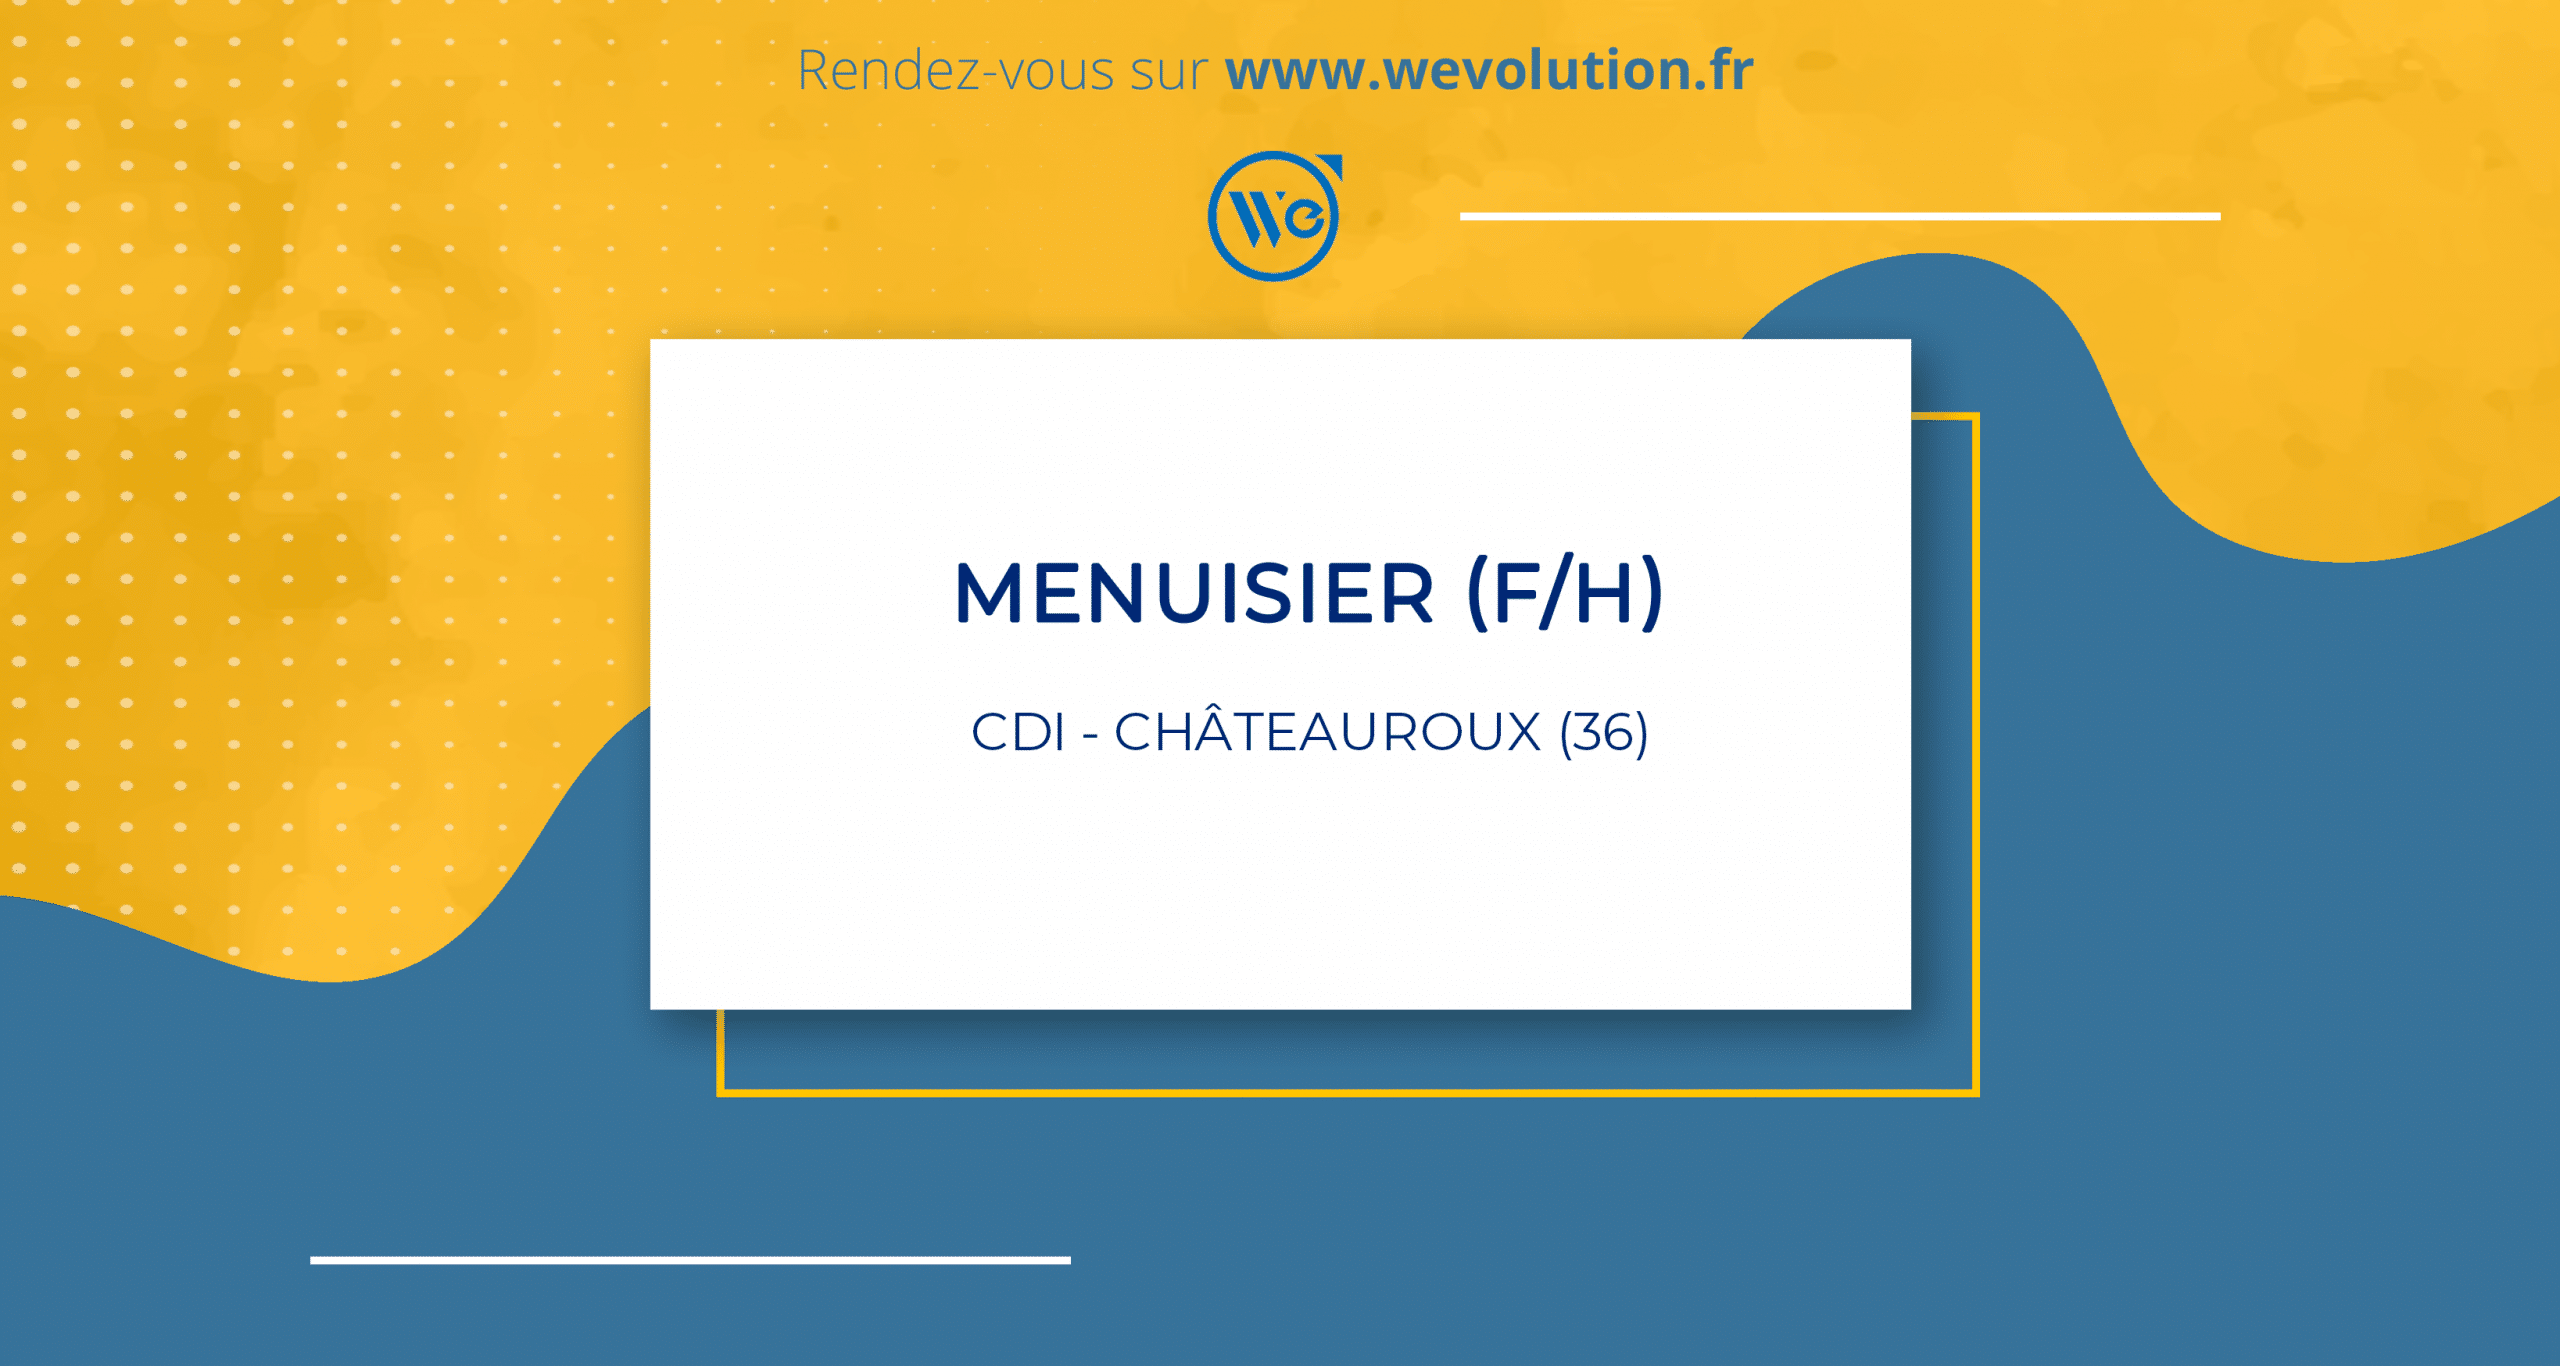 MENUISIER (F/H)